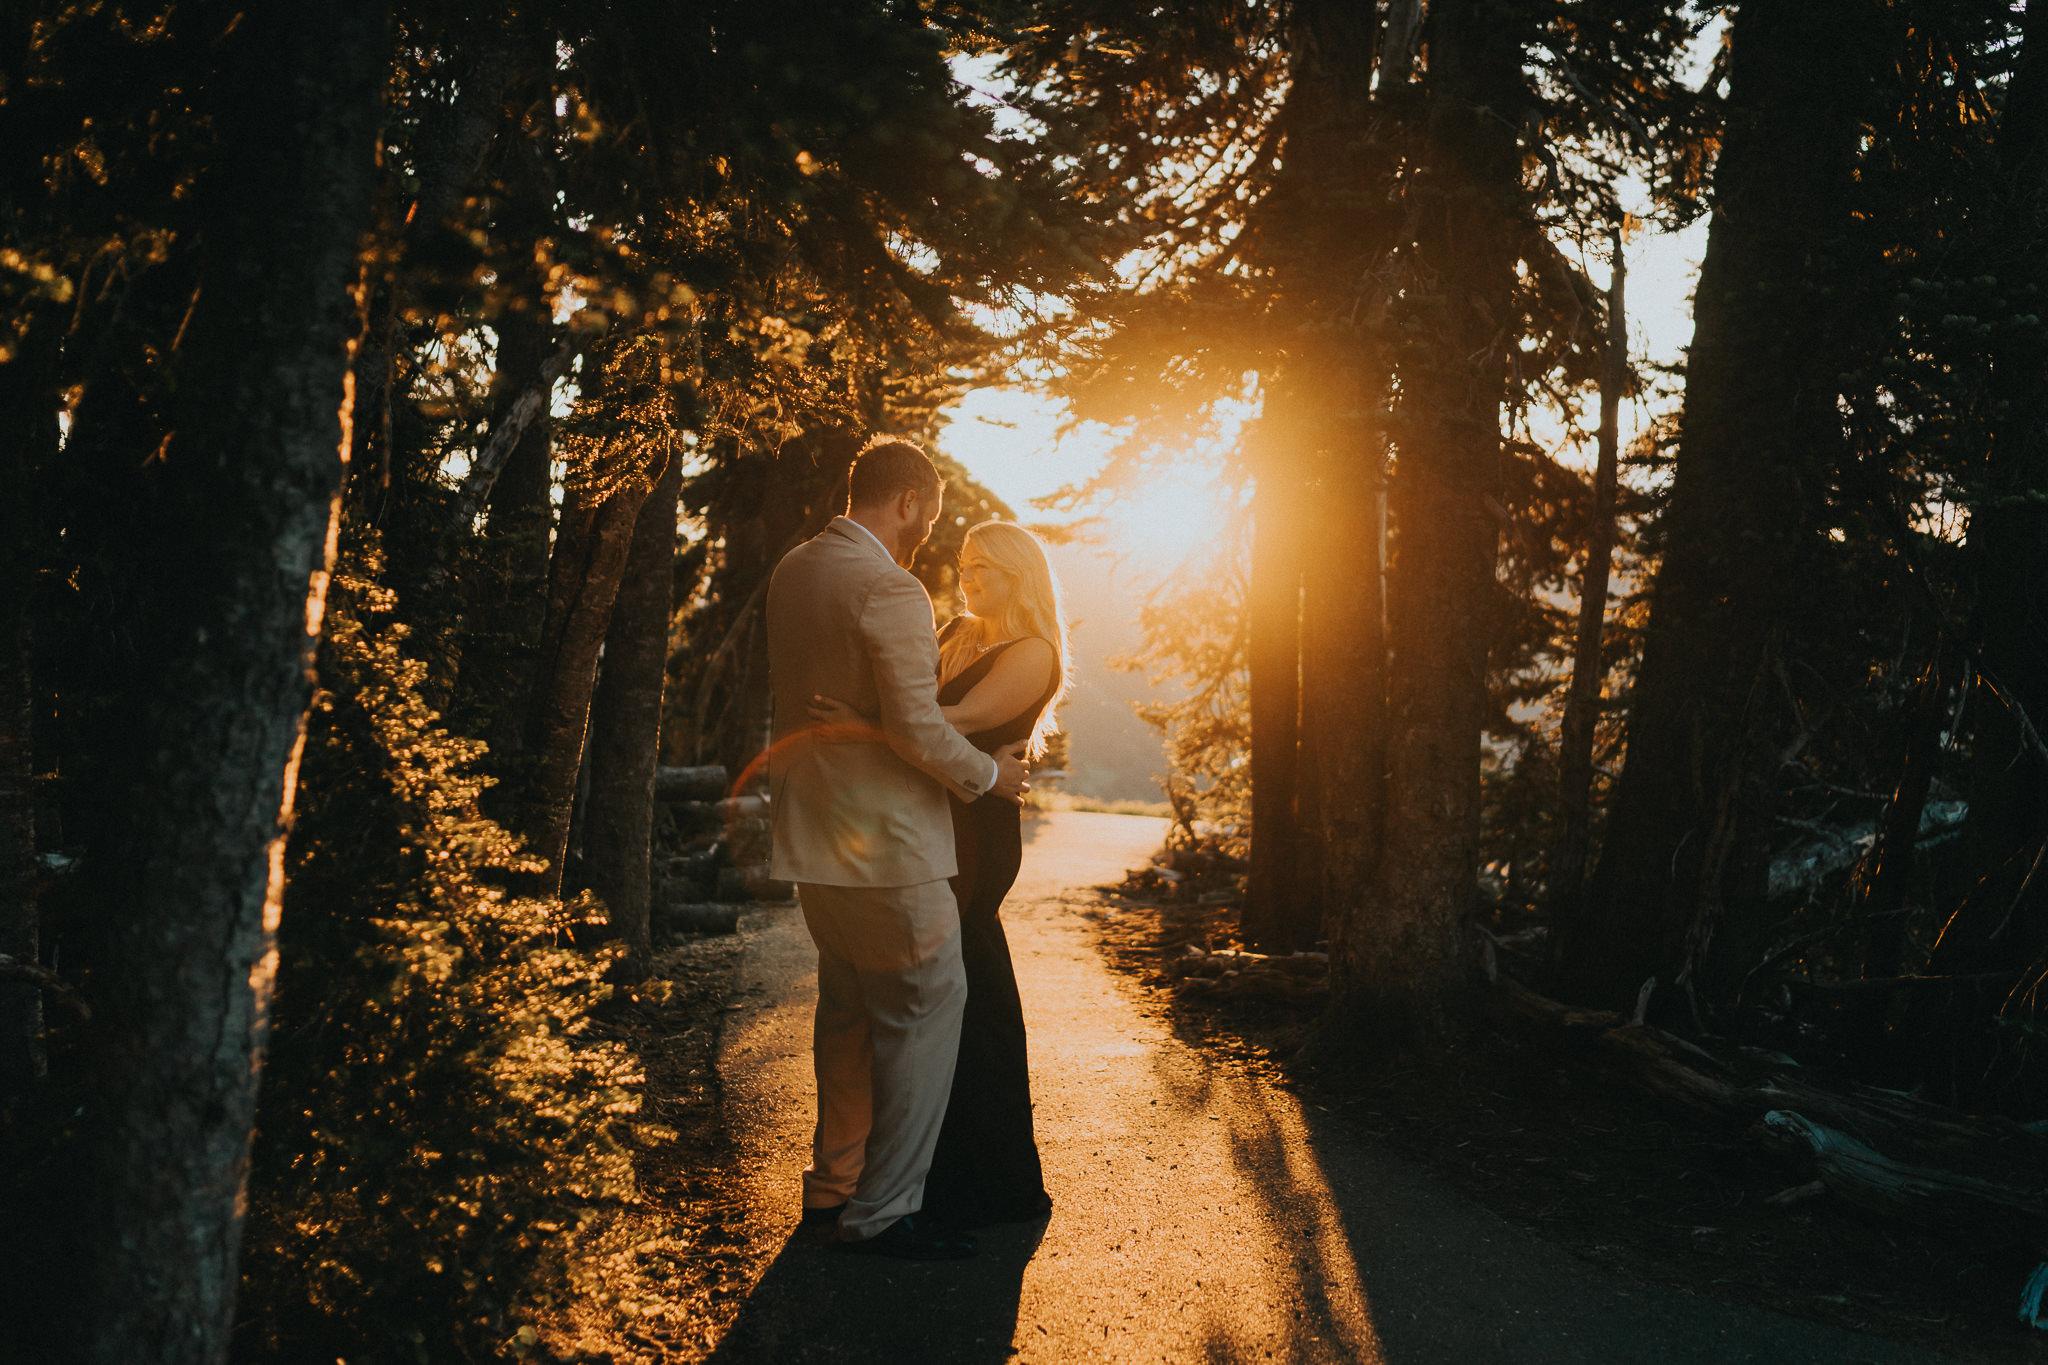 Dance-Intimate-Engagement-Sony-Photographer